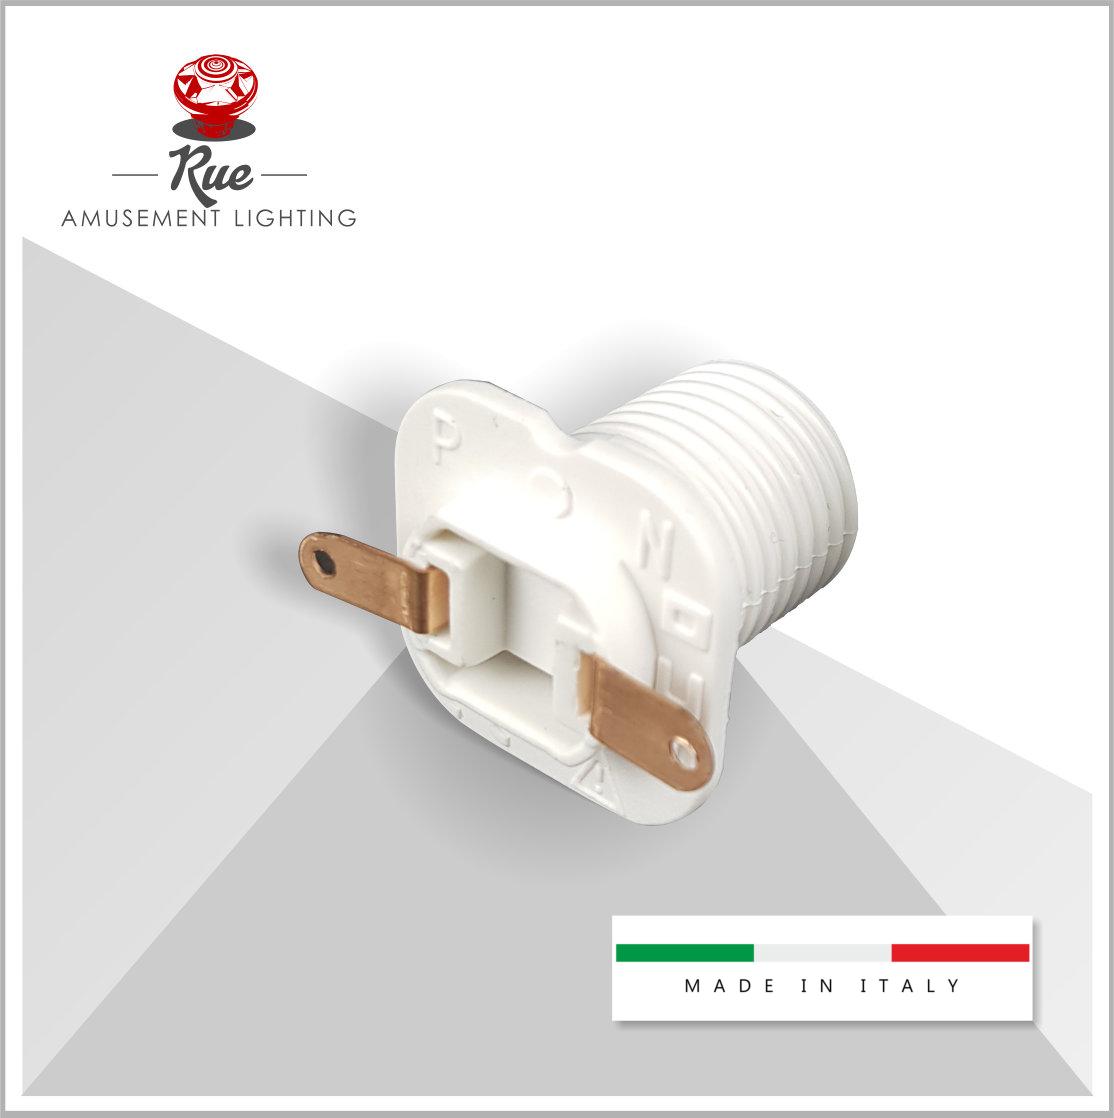 E14 Solder Lamp Holder Rue Amusement Lighting Wiring Metal Bulb Click To Enlarge Homelamp Holders